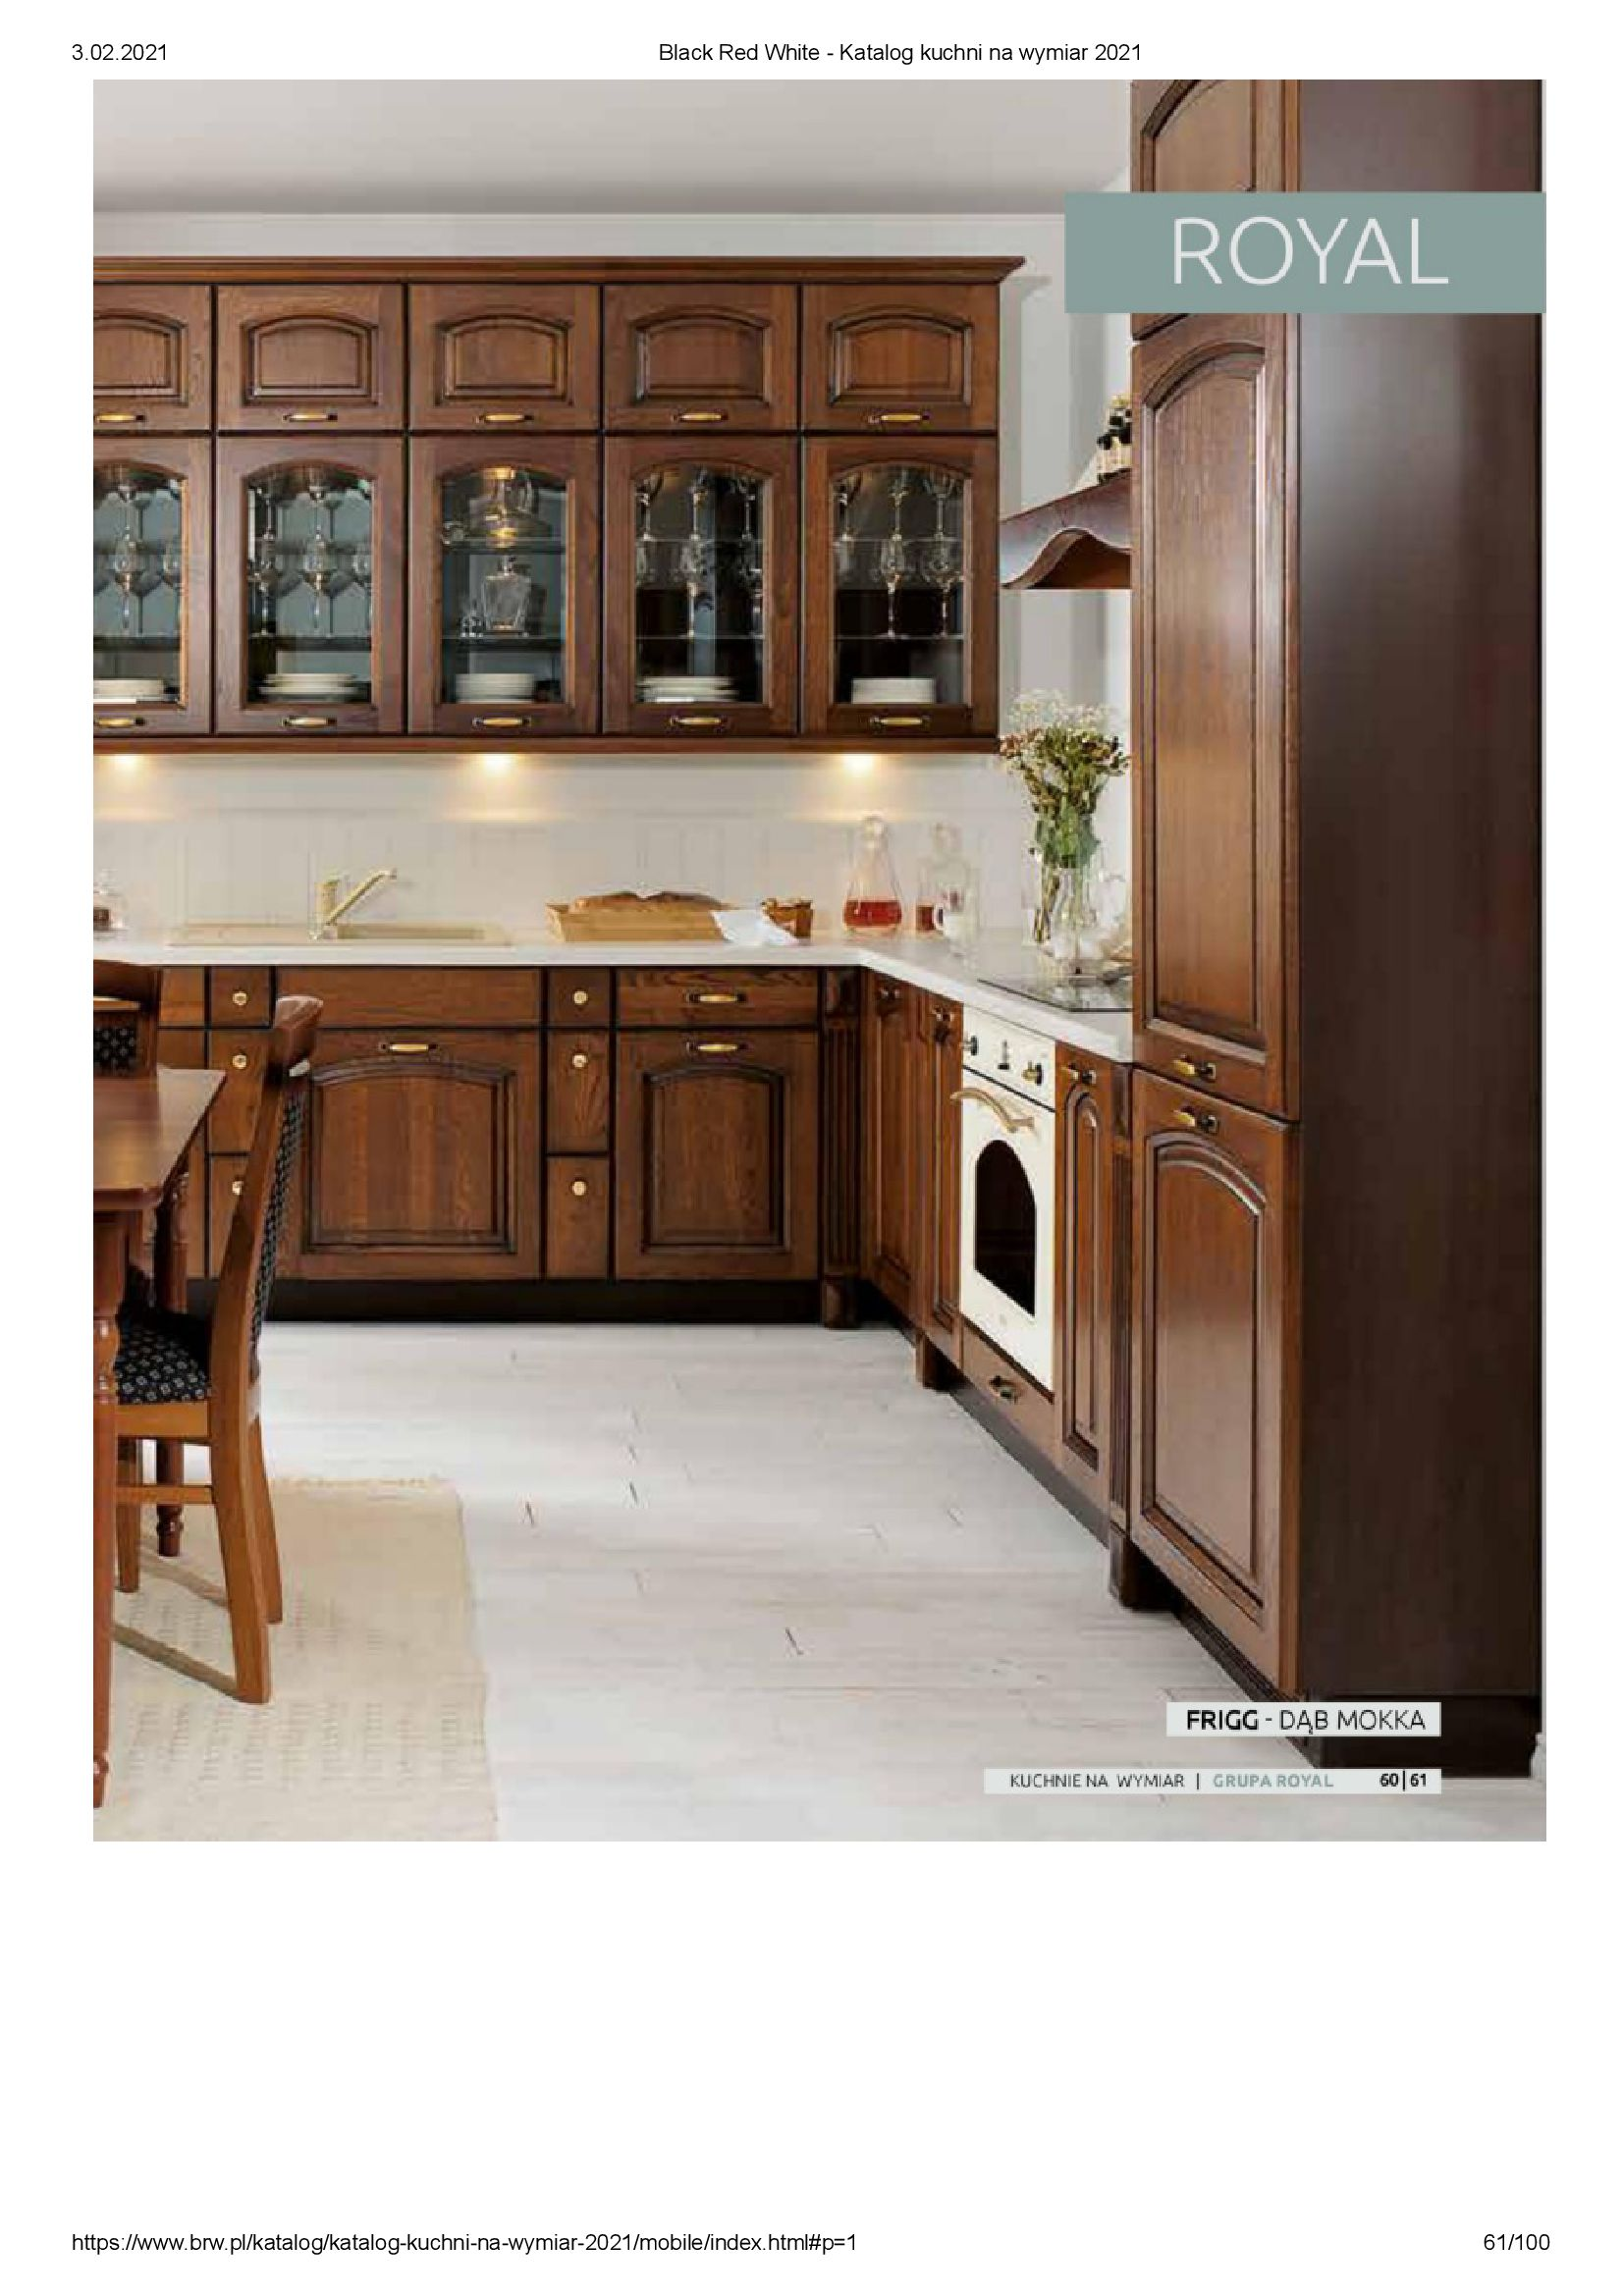 Gazetka Black Red White: Katalog - Kuchnie na wymiar Senso Kitchens 2021 2021-01-01 page-61